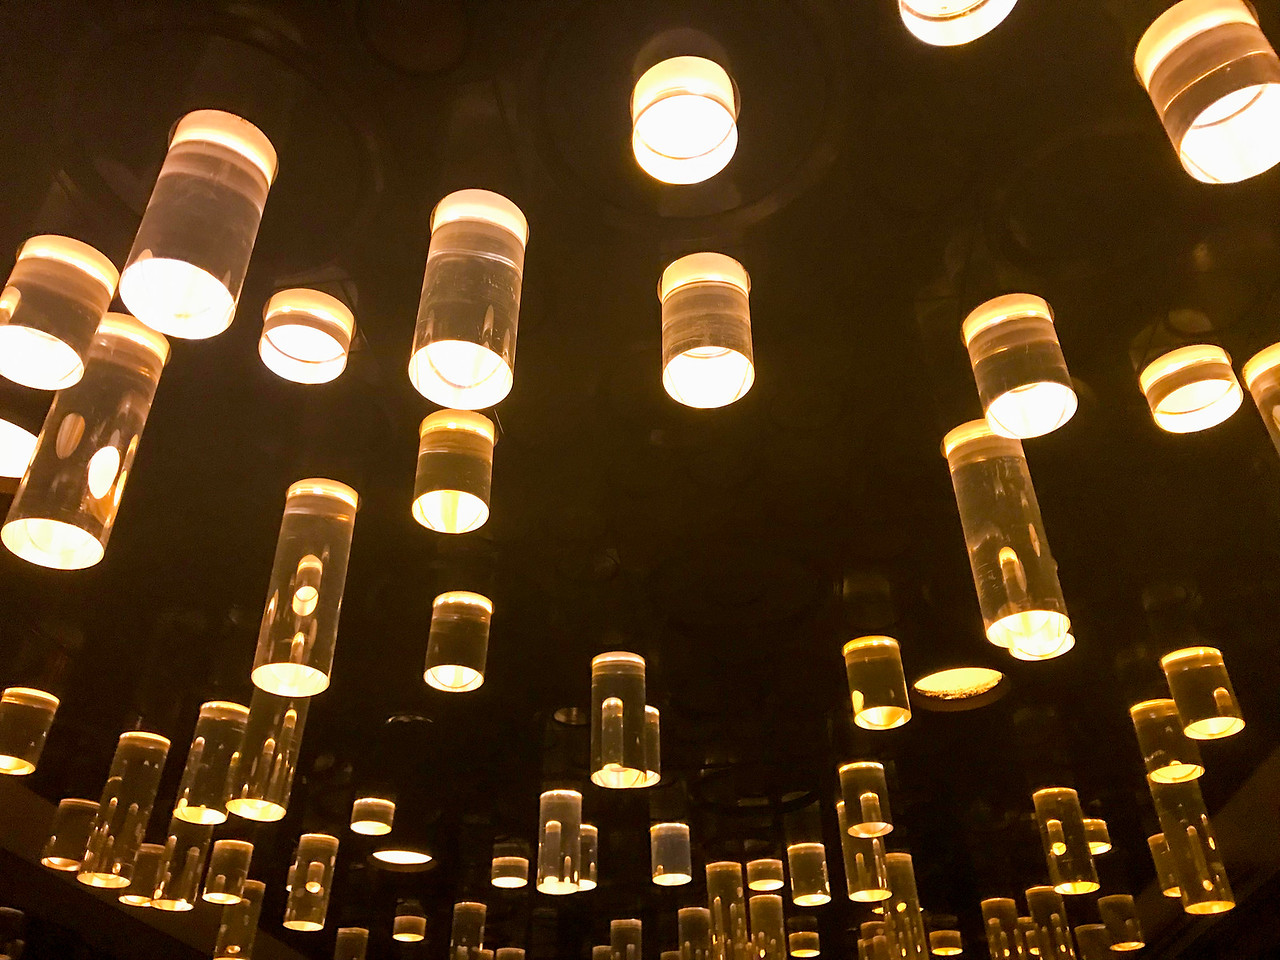 Cool lights at The Standard Biergarten in New York City.